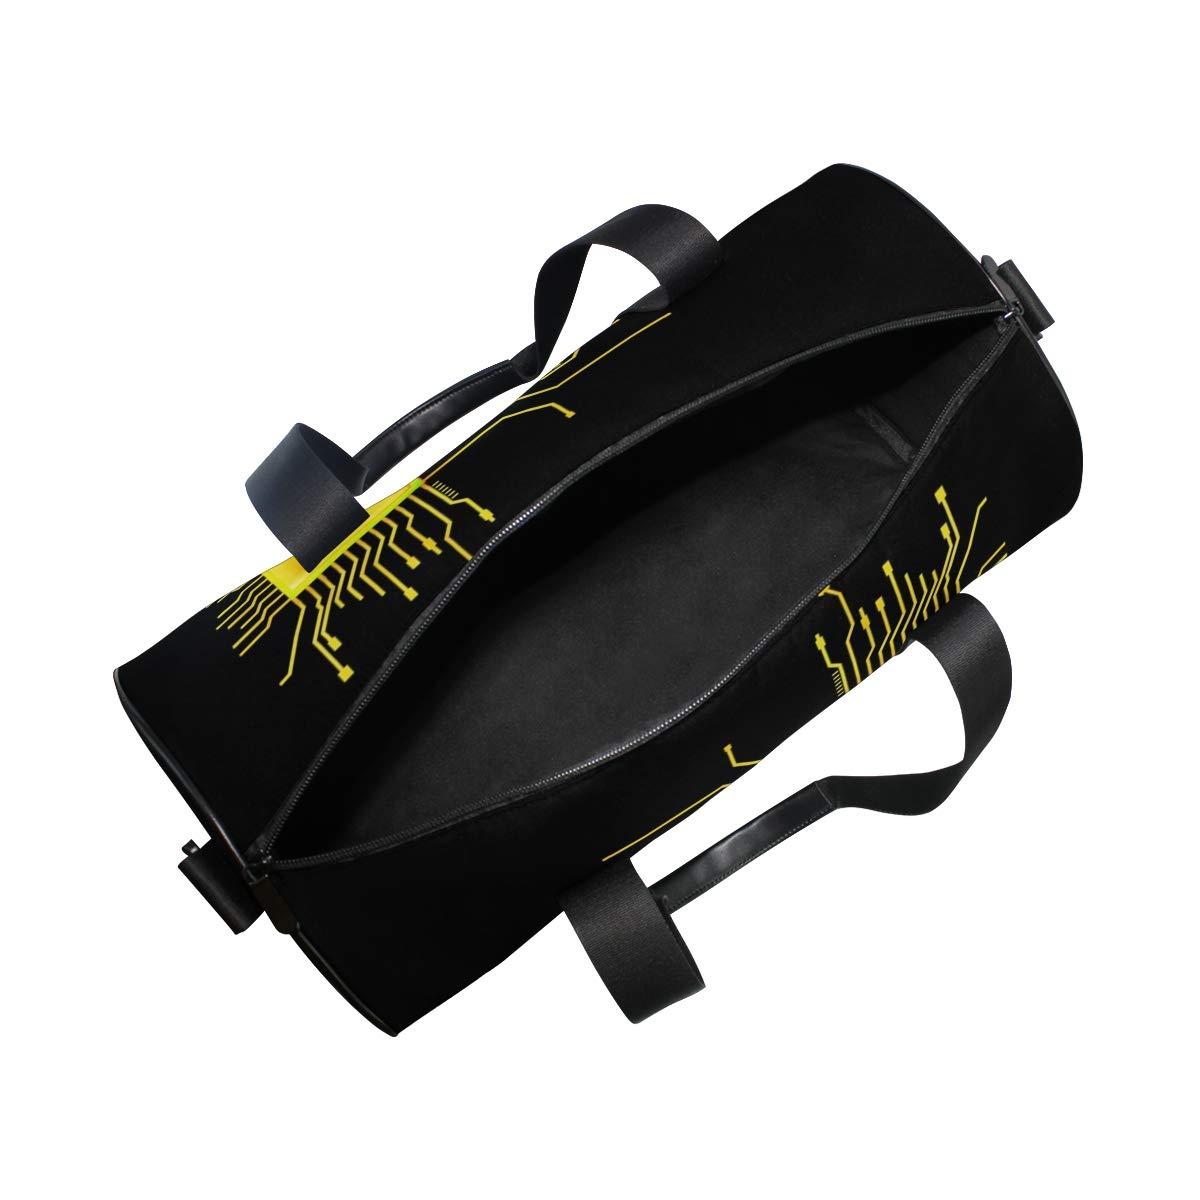 Gym Bag with Computer Geek Circuit Nerd Print Travel Weekender Duffel Bag for Man and Woman